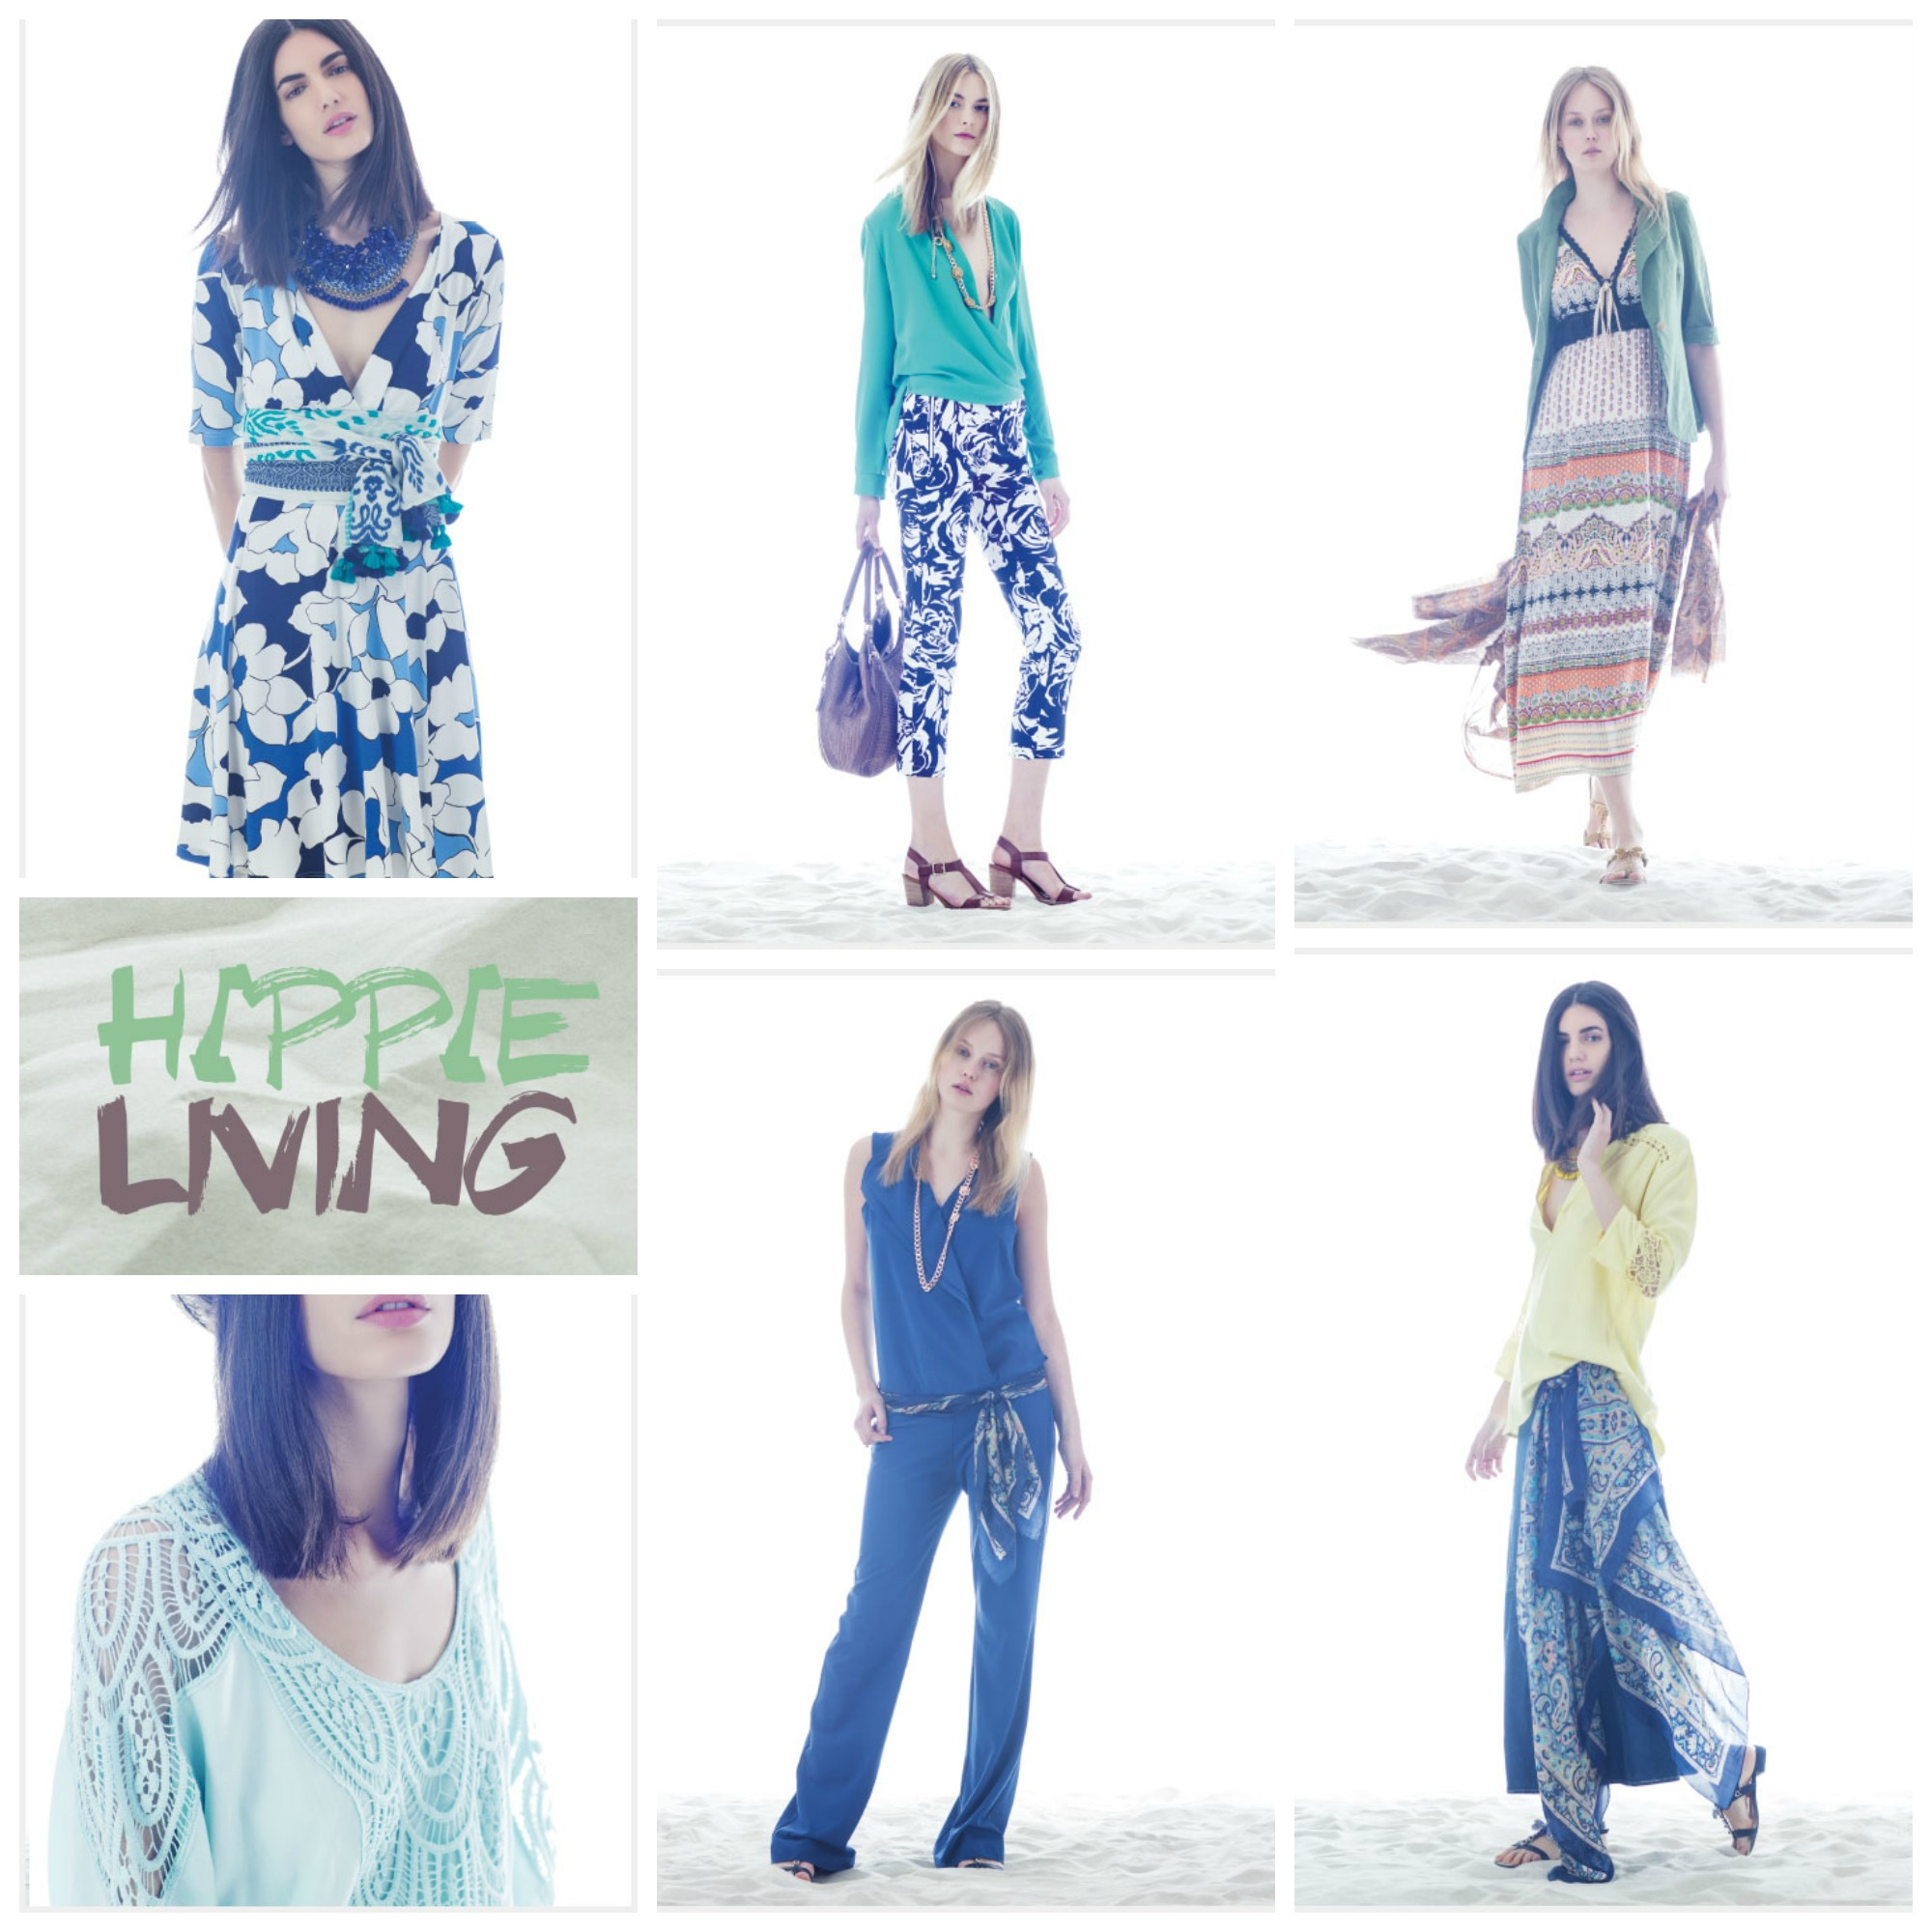 hippie living stile camomilla